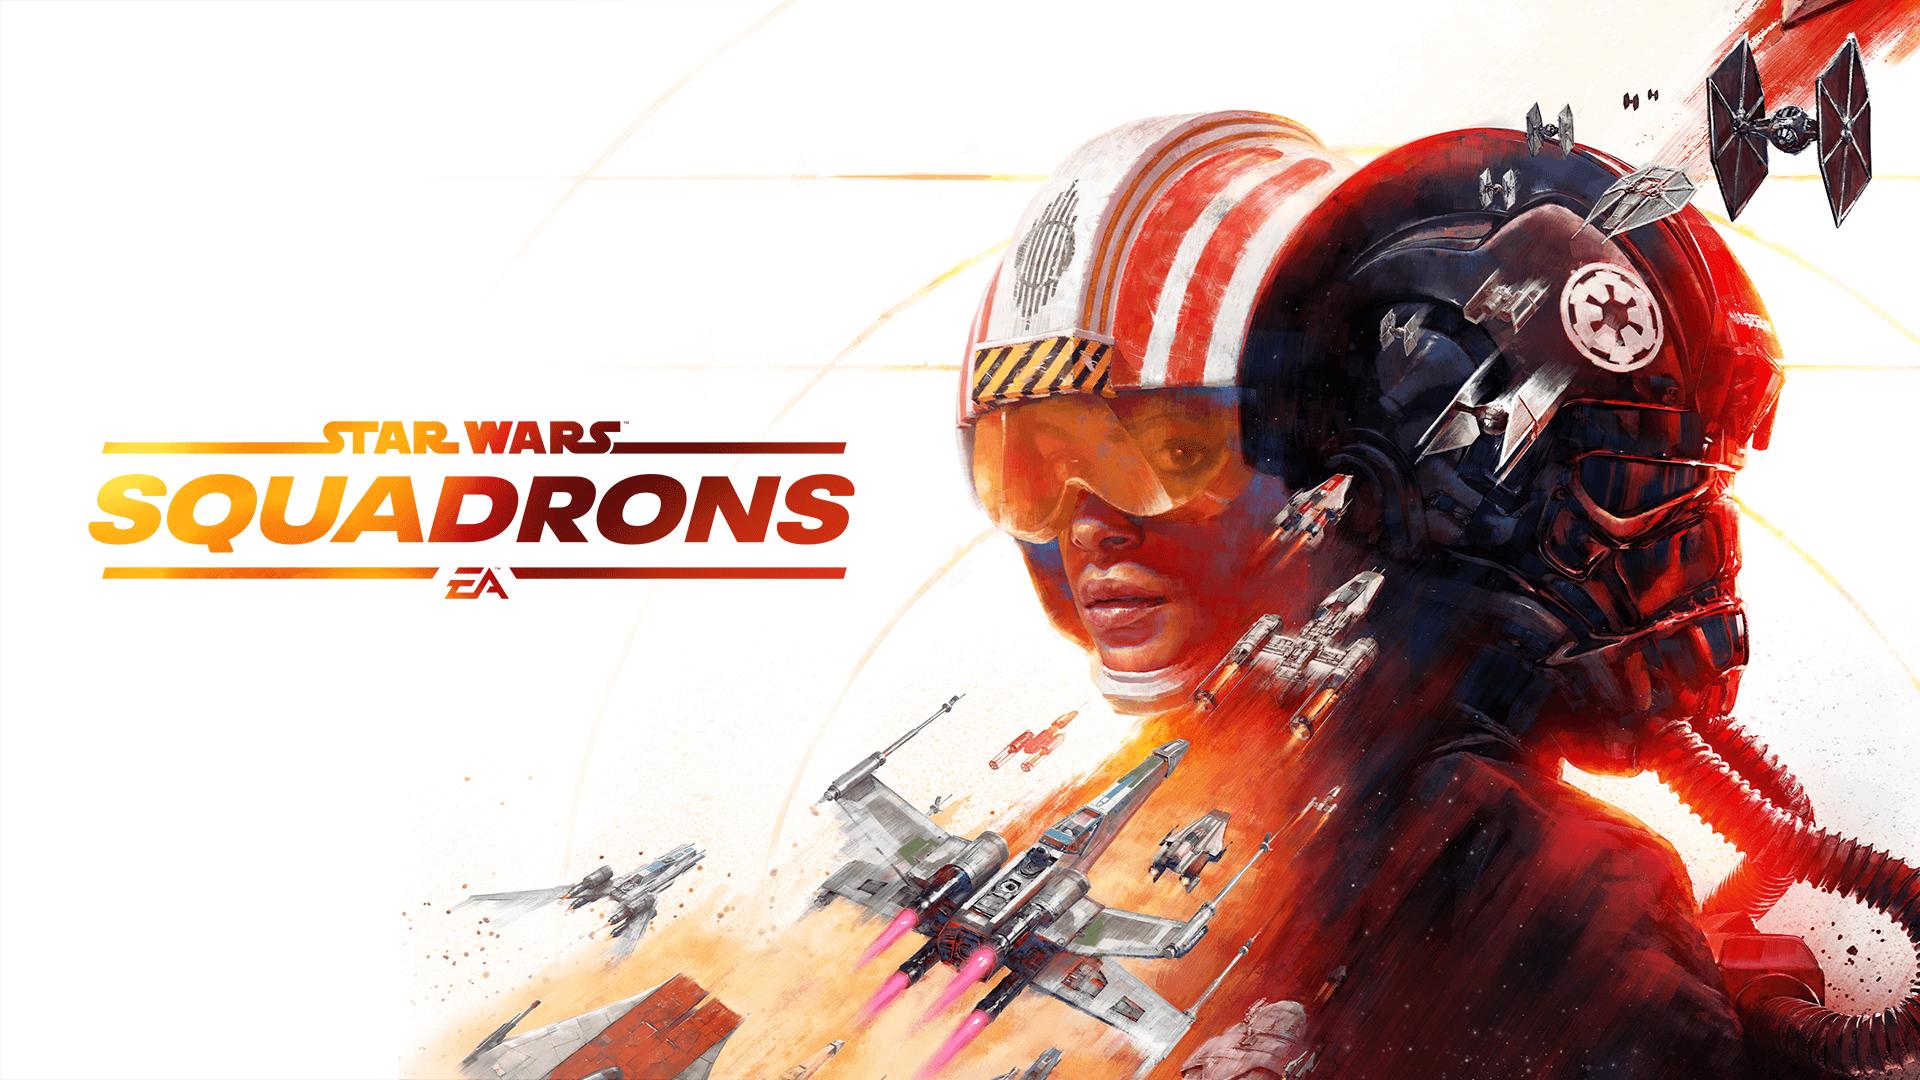 Star Wars: Squadrons (RUS) со скидкой, офлайн, denuvo САМОАКТИВАЦИЯ | PC | Origin